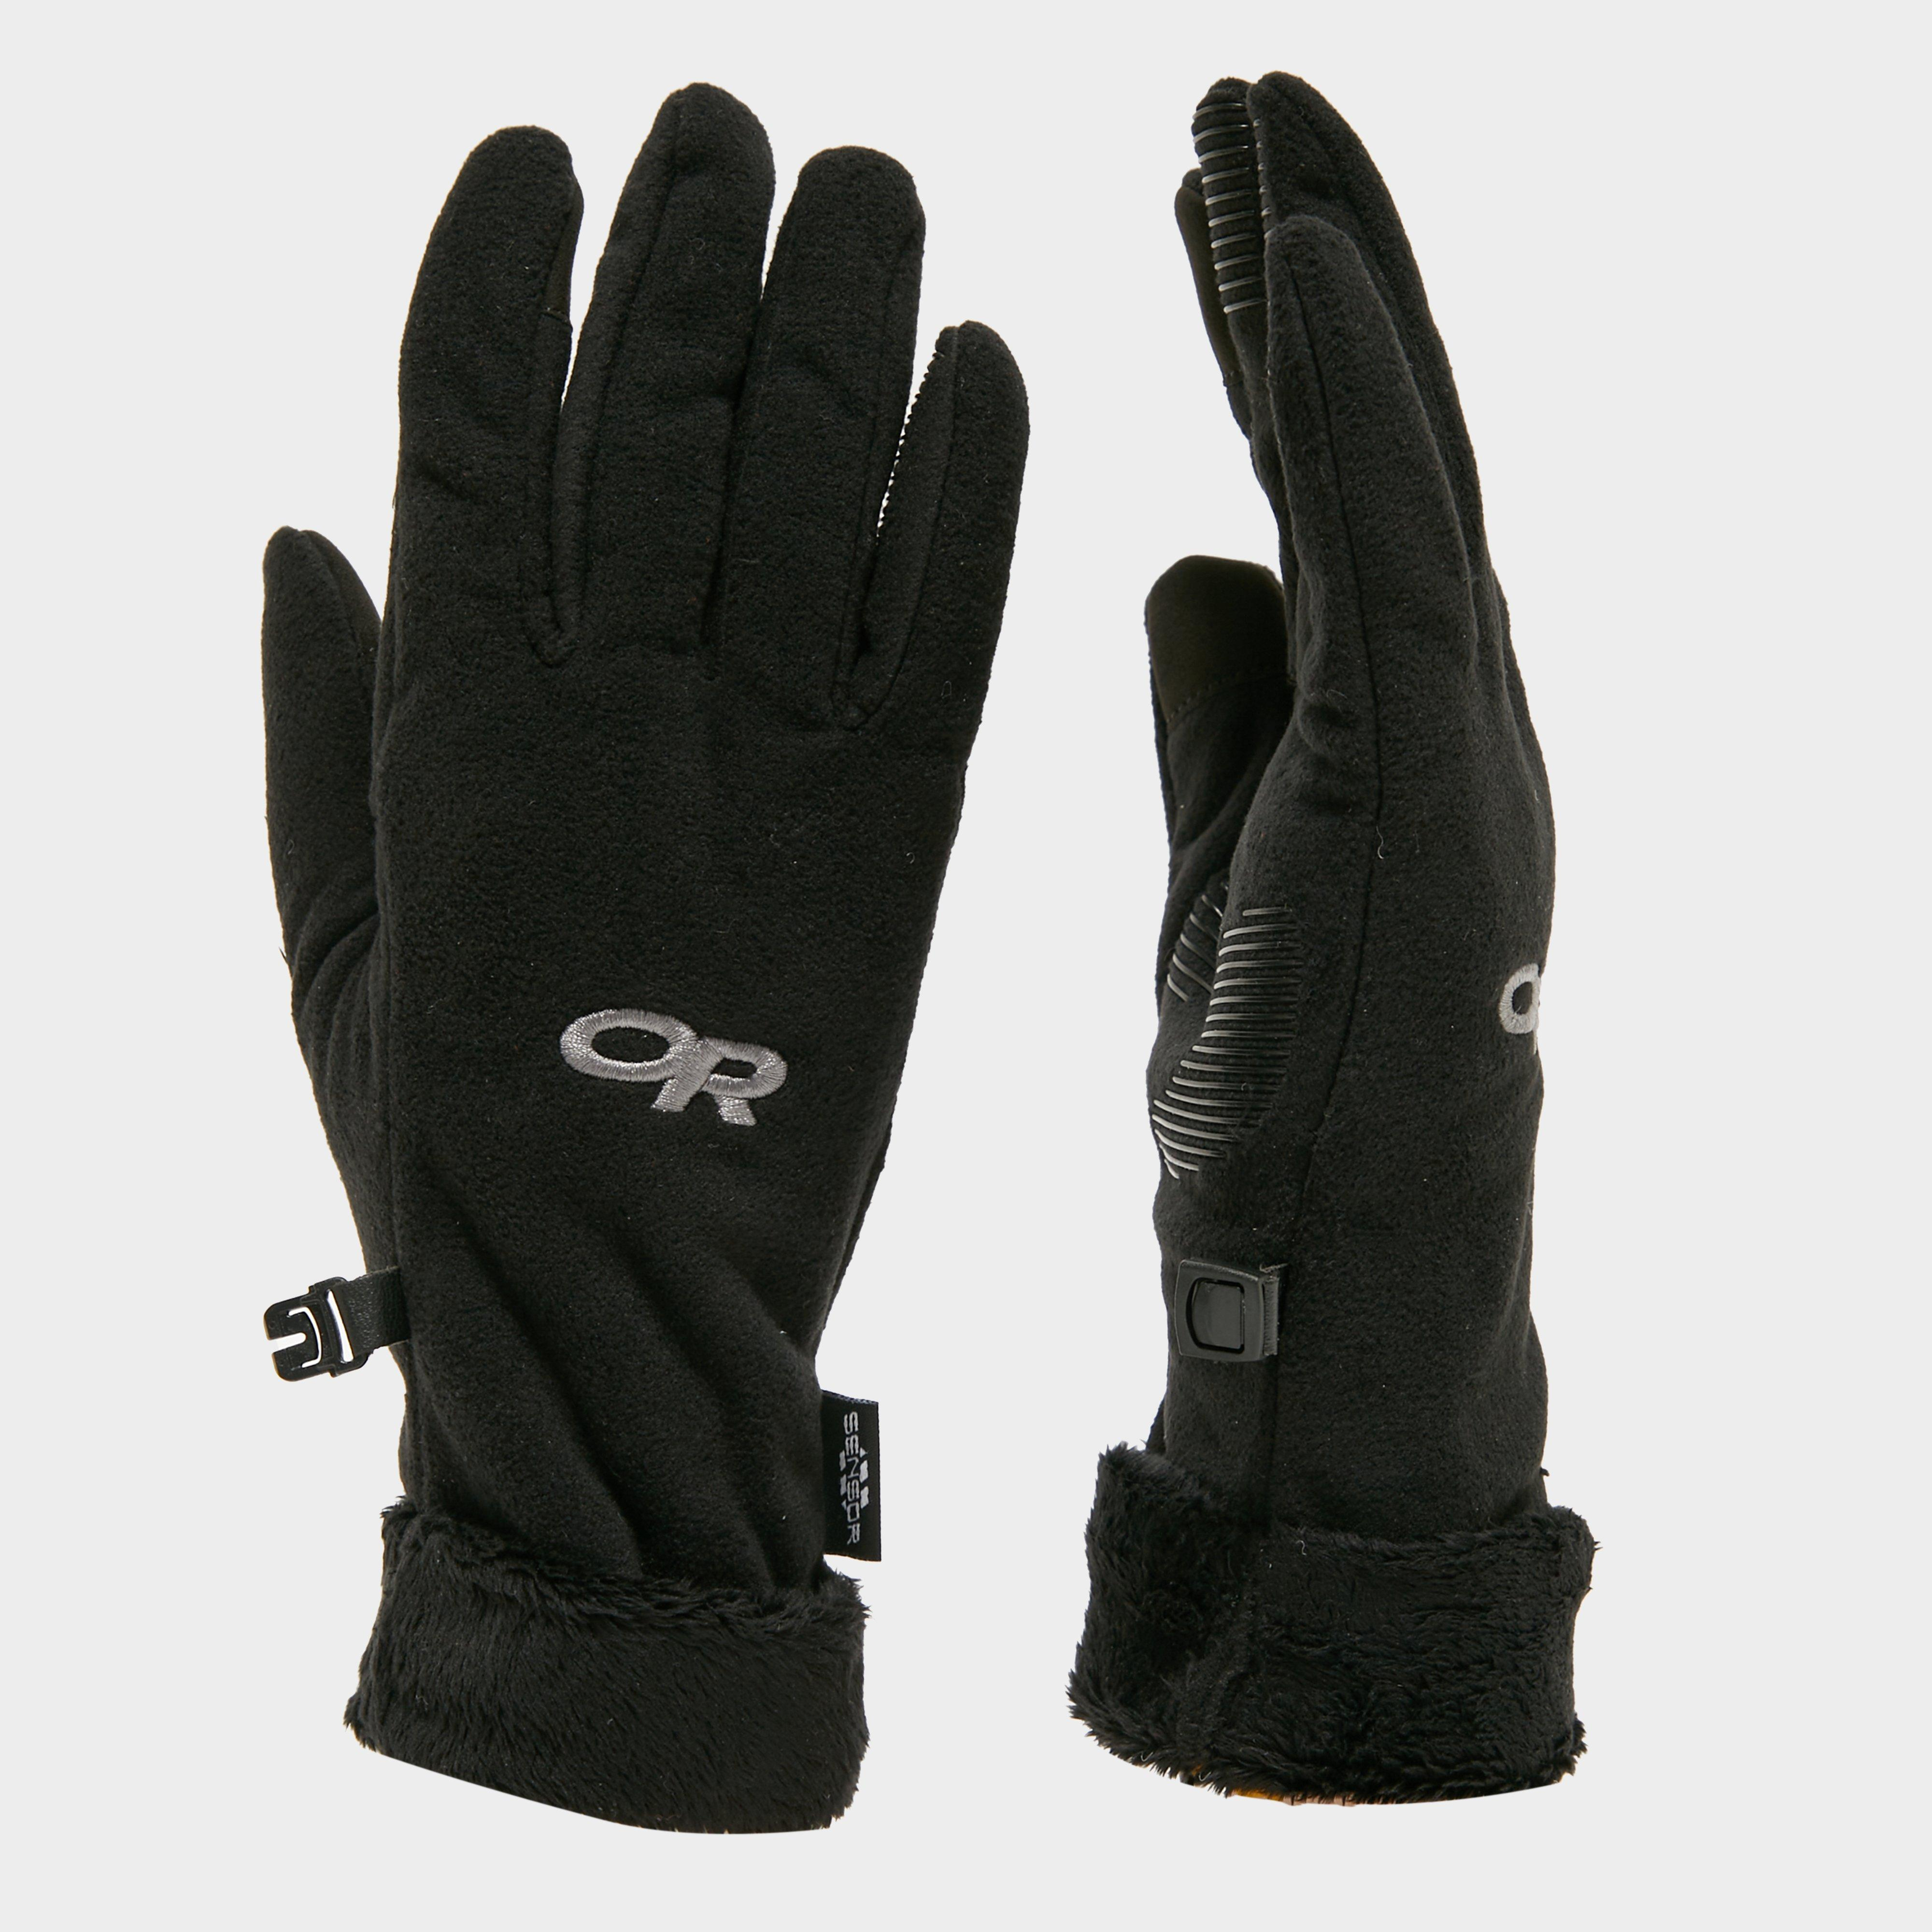 Outdoor Research Womens Fuzy Sensor Gloves - Black/blk  Black/blk